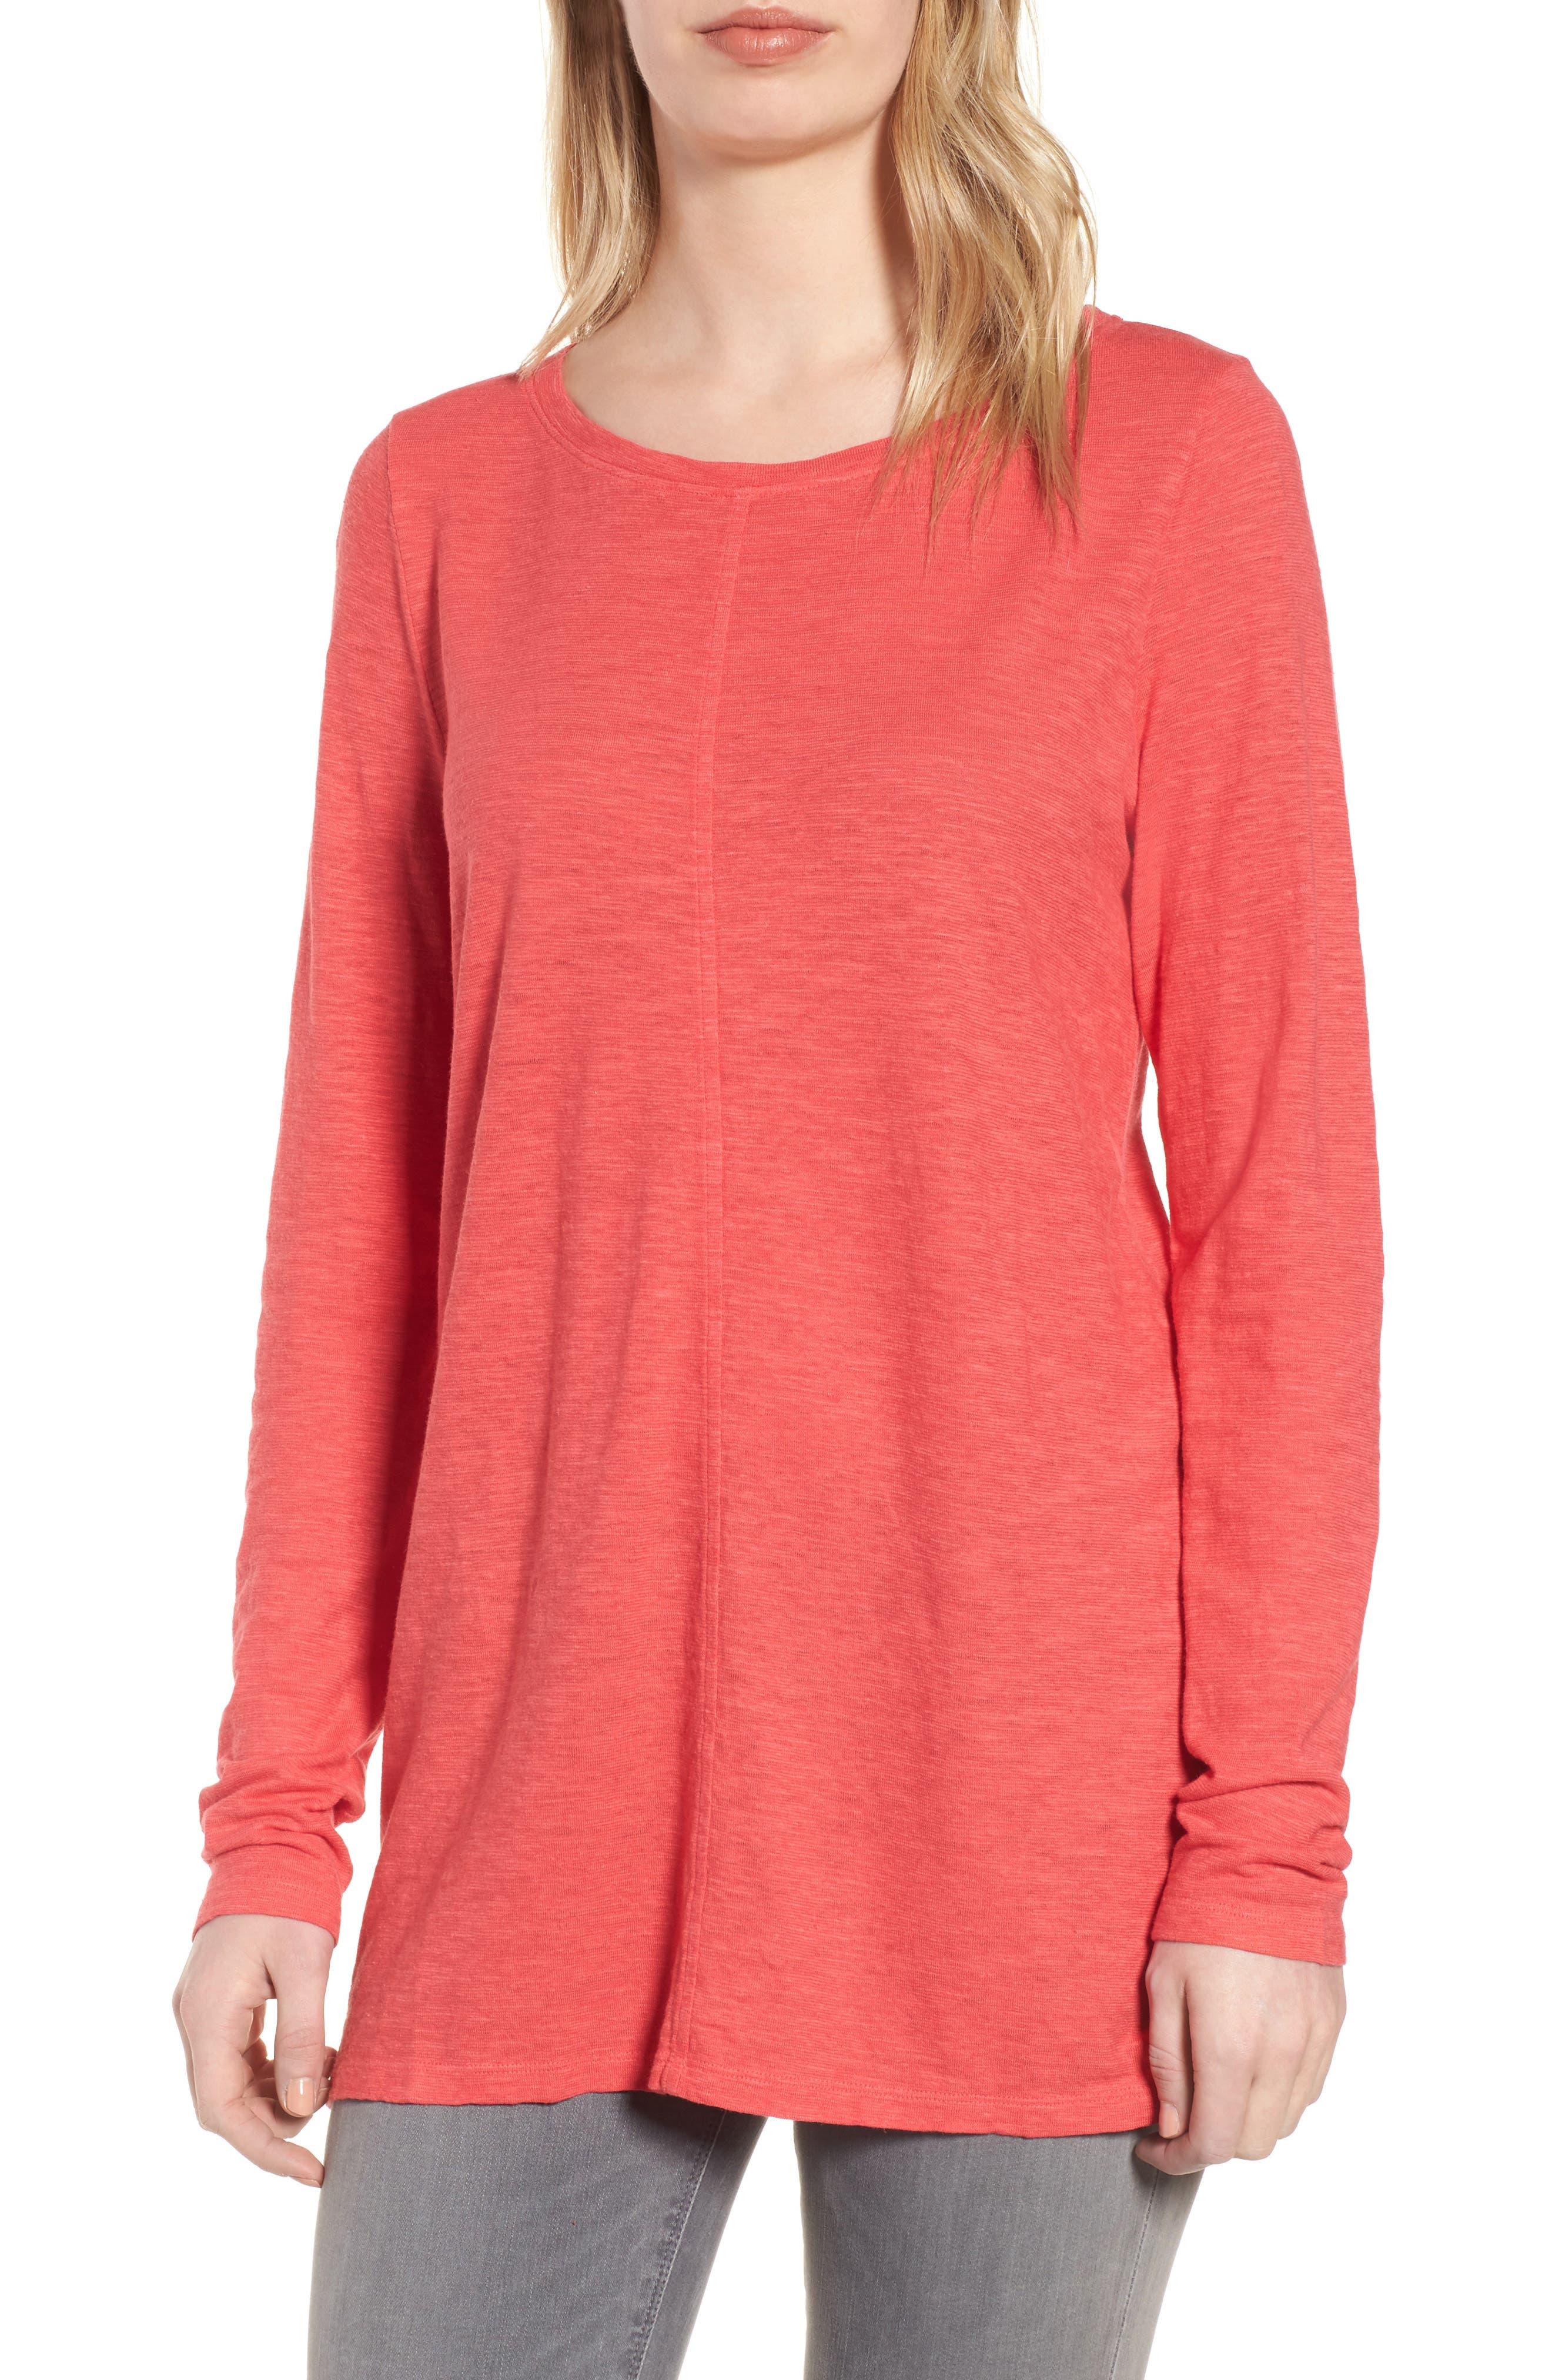 Eileen Fisher Slub Jersey Tunic Top (Regular & Petite)